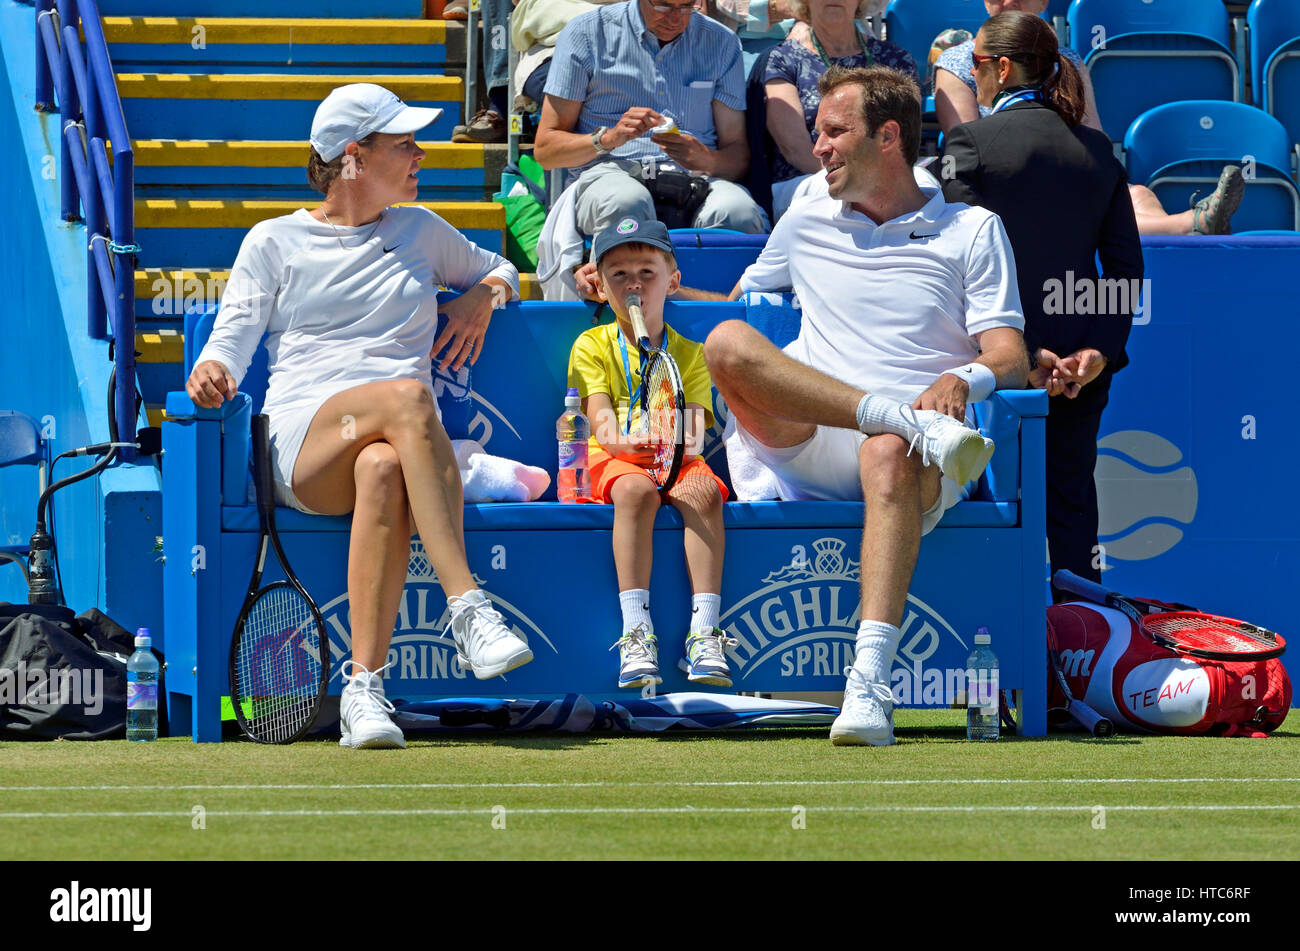 Greg Rusedski (GB) partnering Lindsay Davenport, with Greg's son John, between games at the AEGON INTERNATIONAL - Stock Image